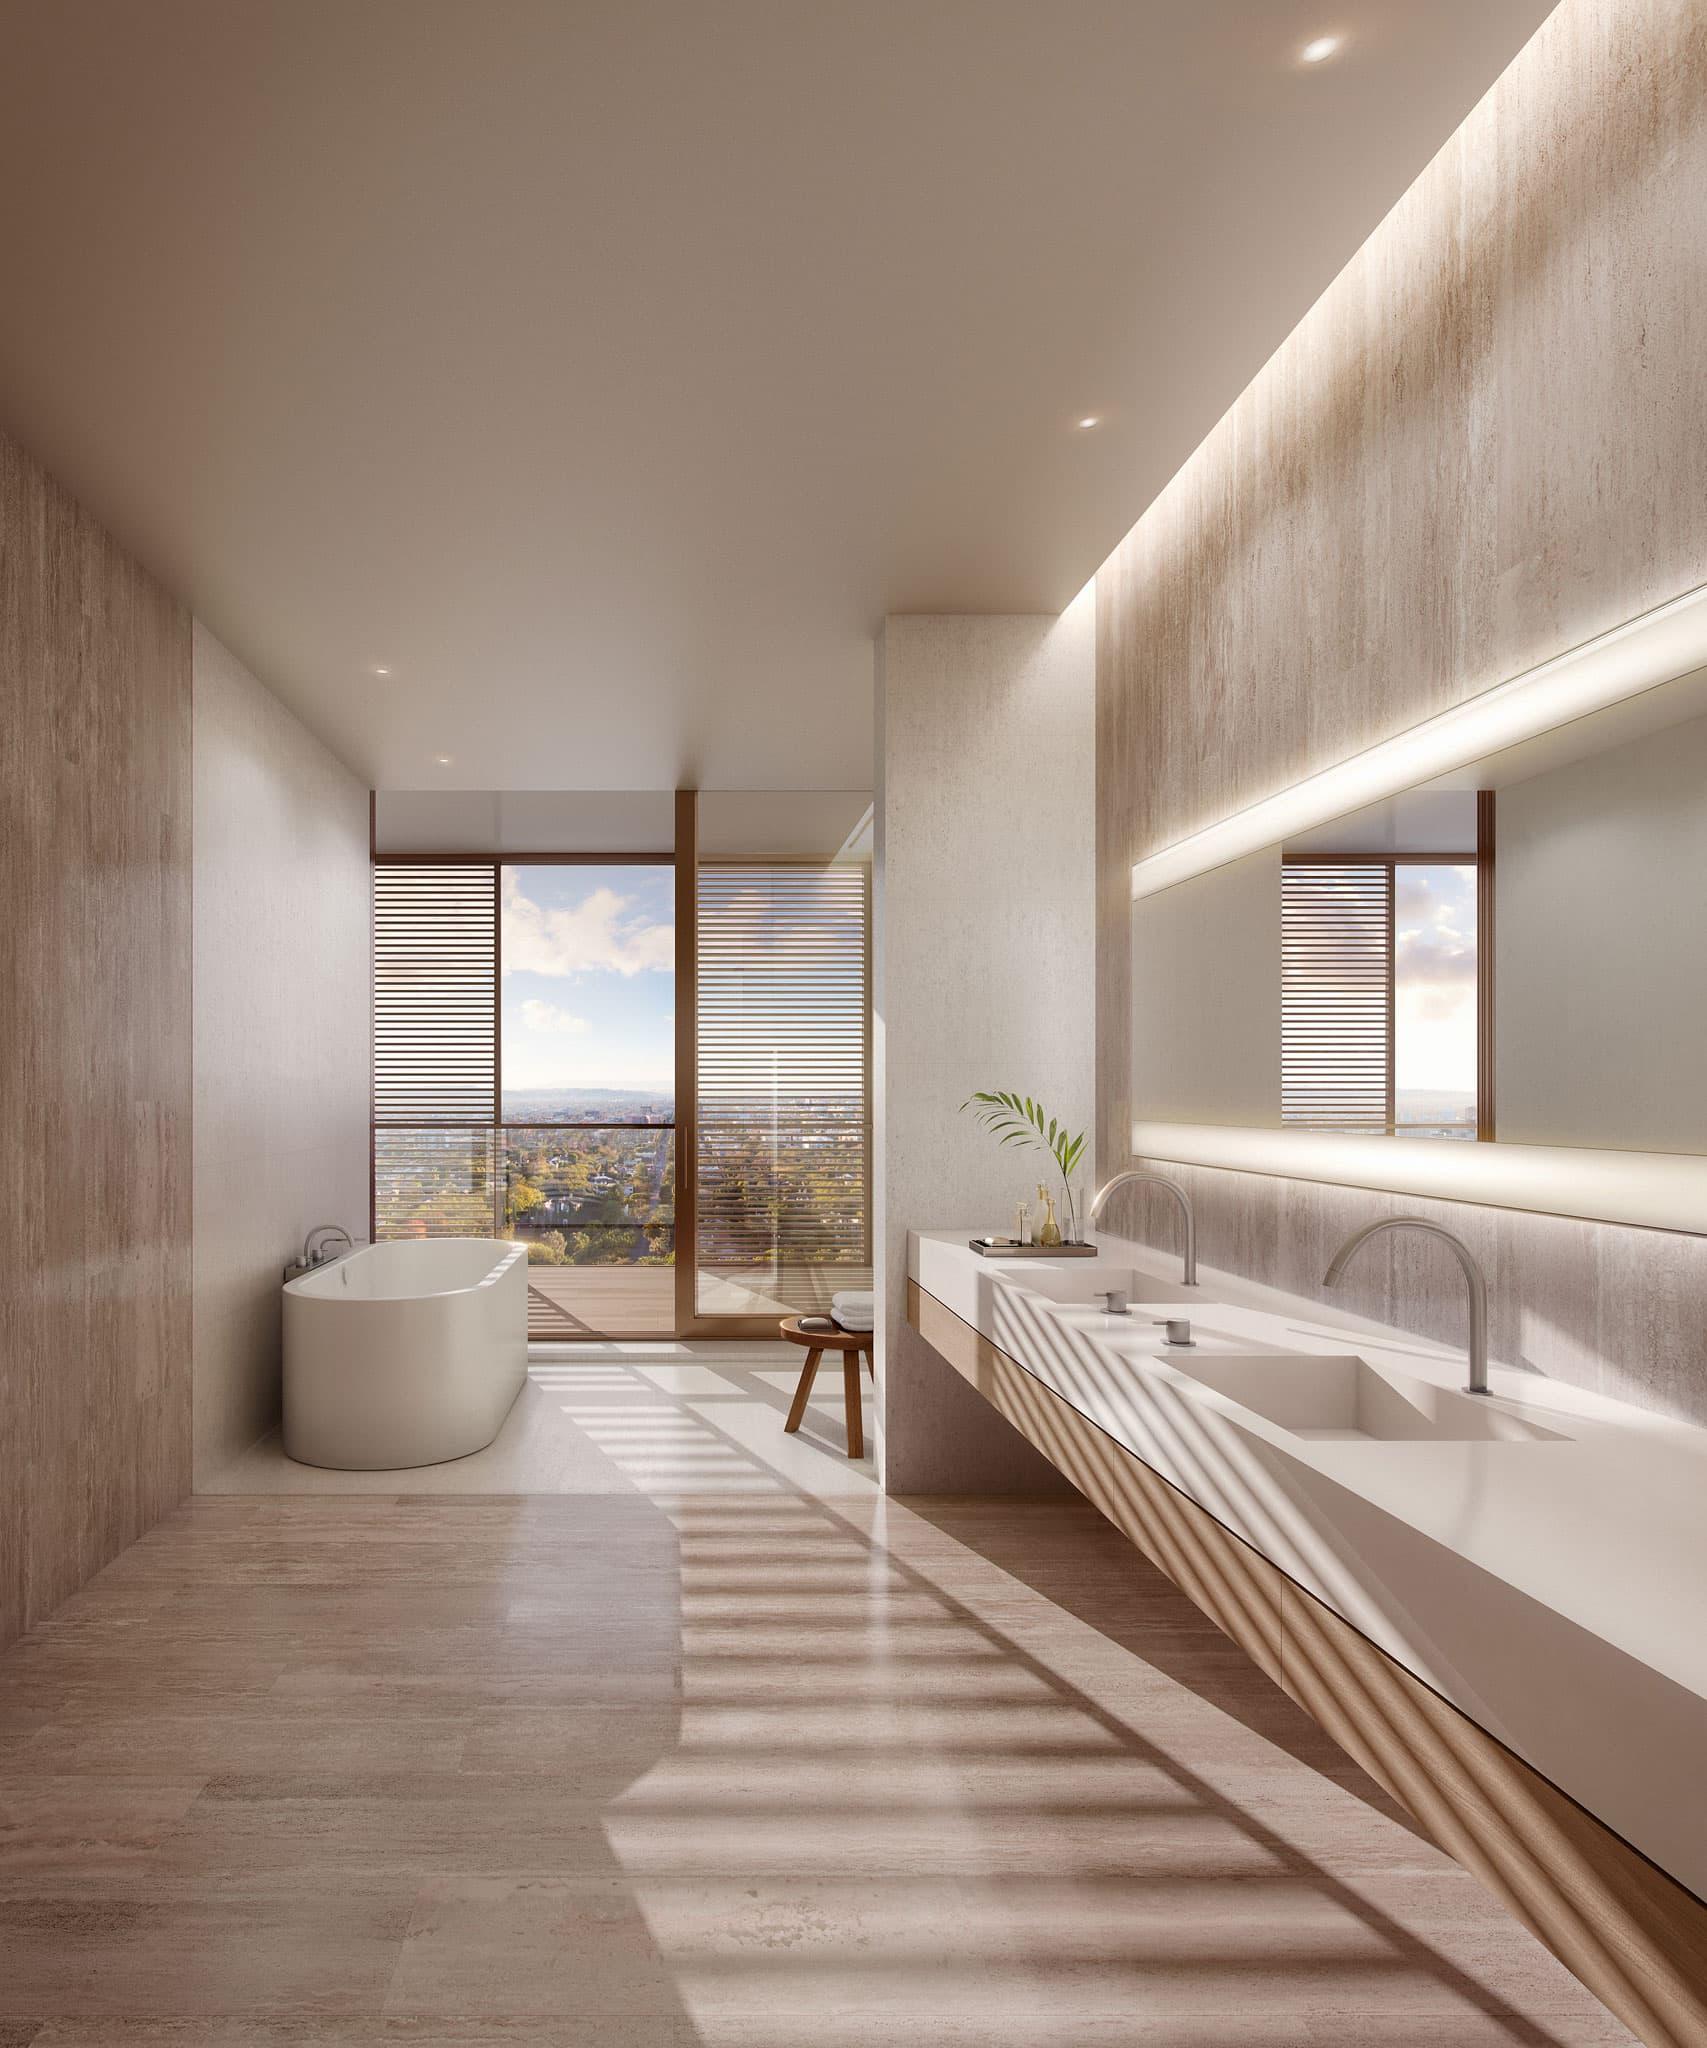 Master bathrooms and powder rooms feature custom floating vanities